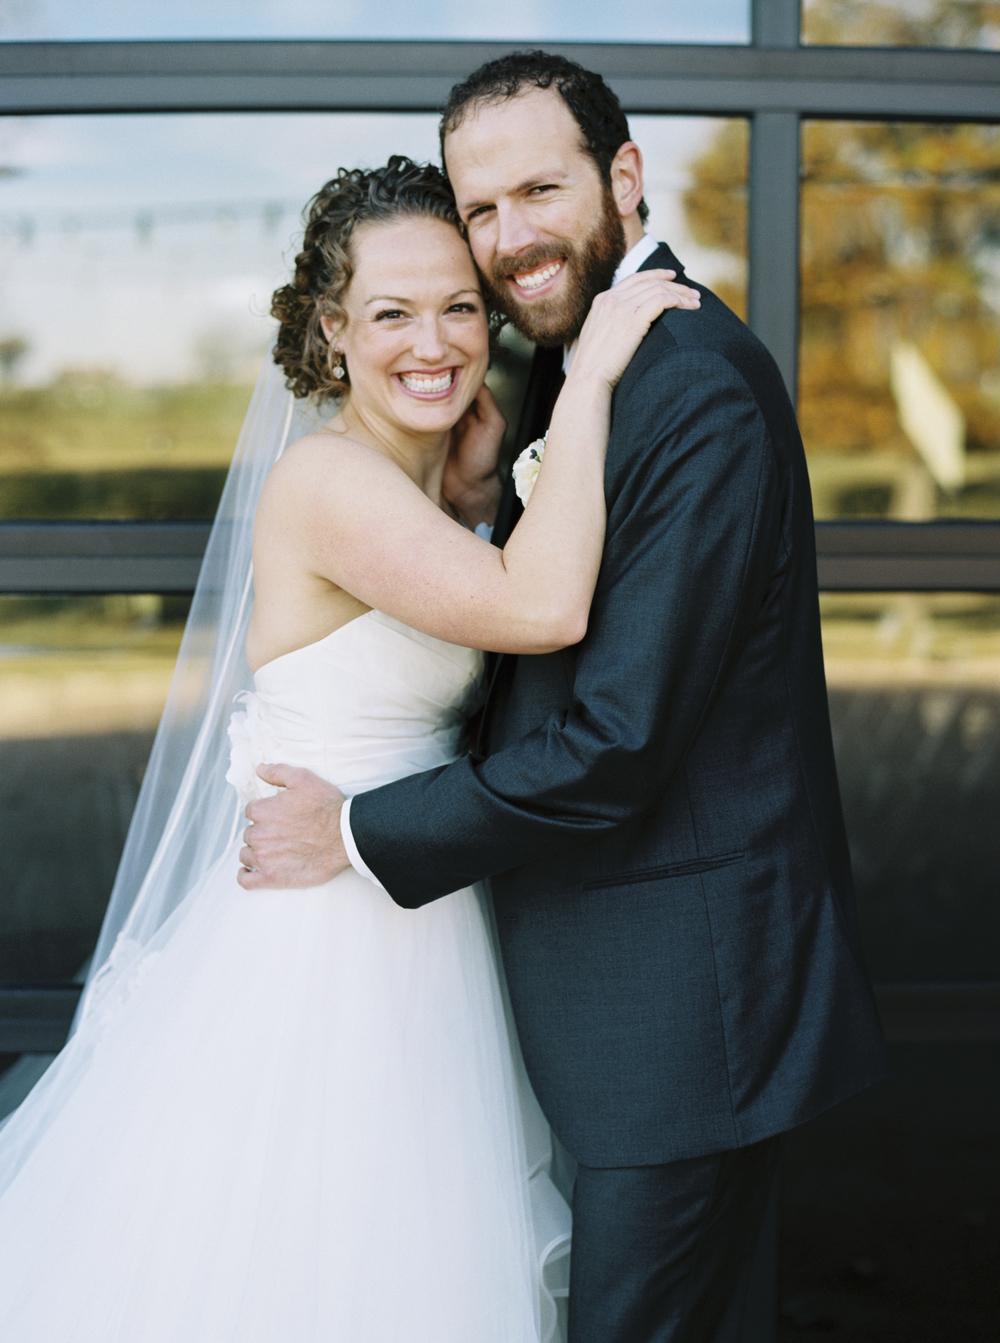 Bride&Groom100Cortney B Photography.JPG